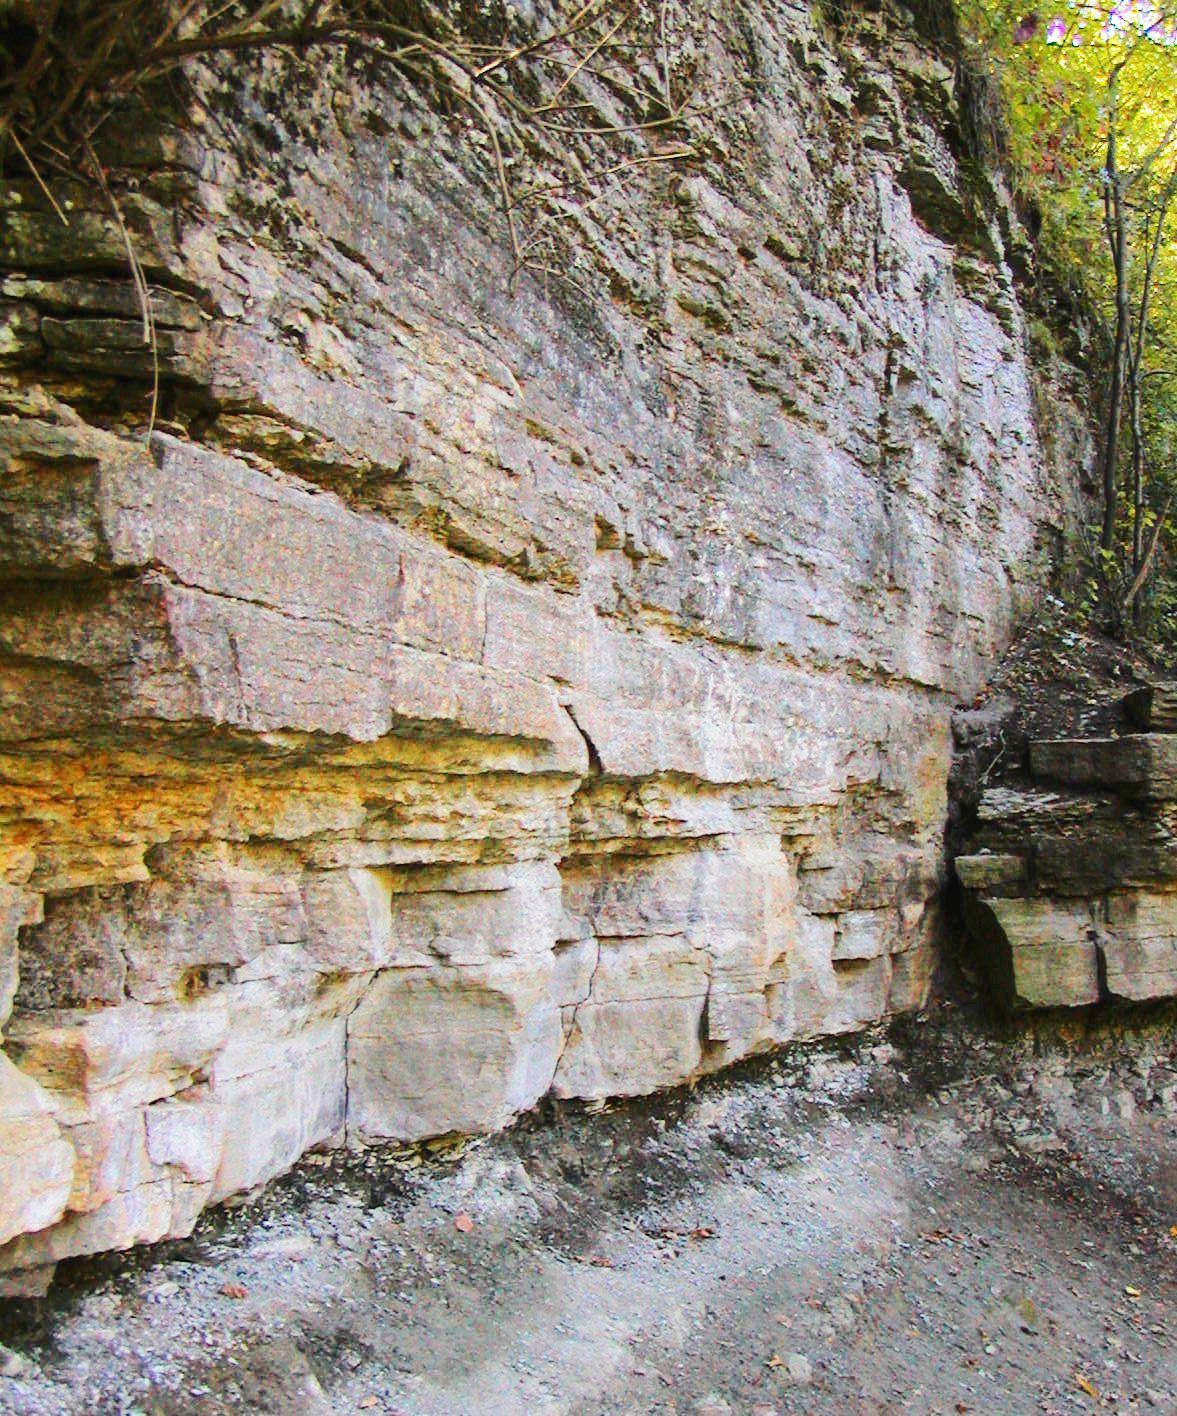 http://upload.wikimedia.org/wikipedia/commons/2/2e/Limestone-sandstone.jpg